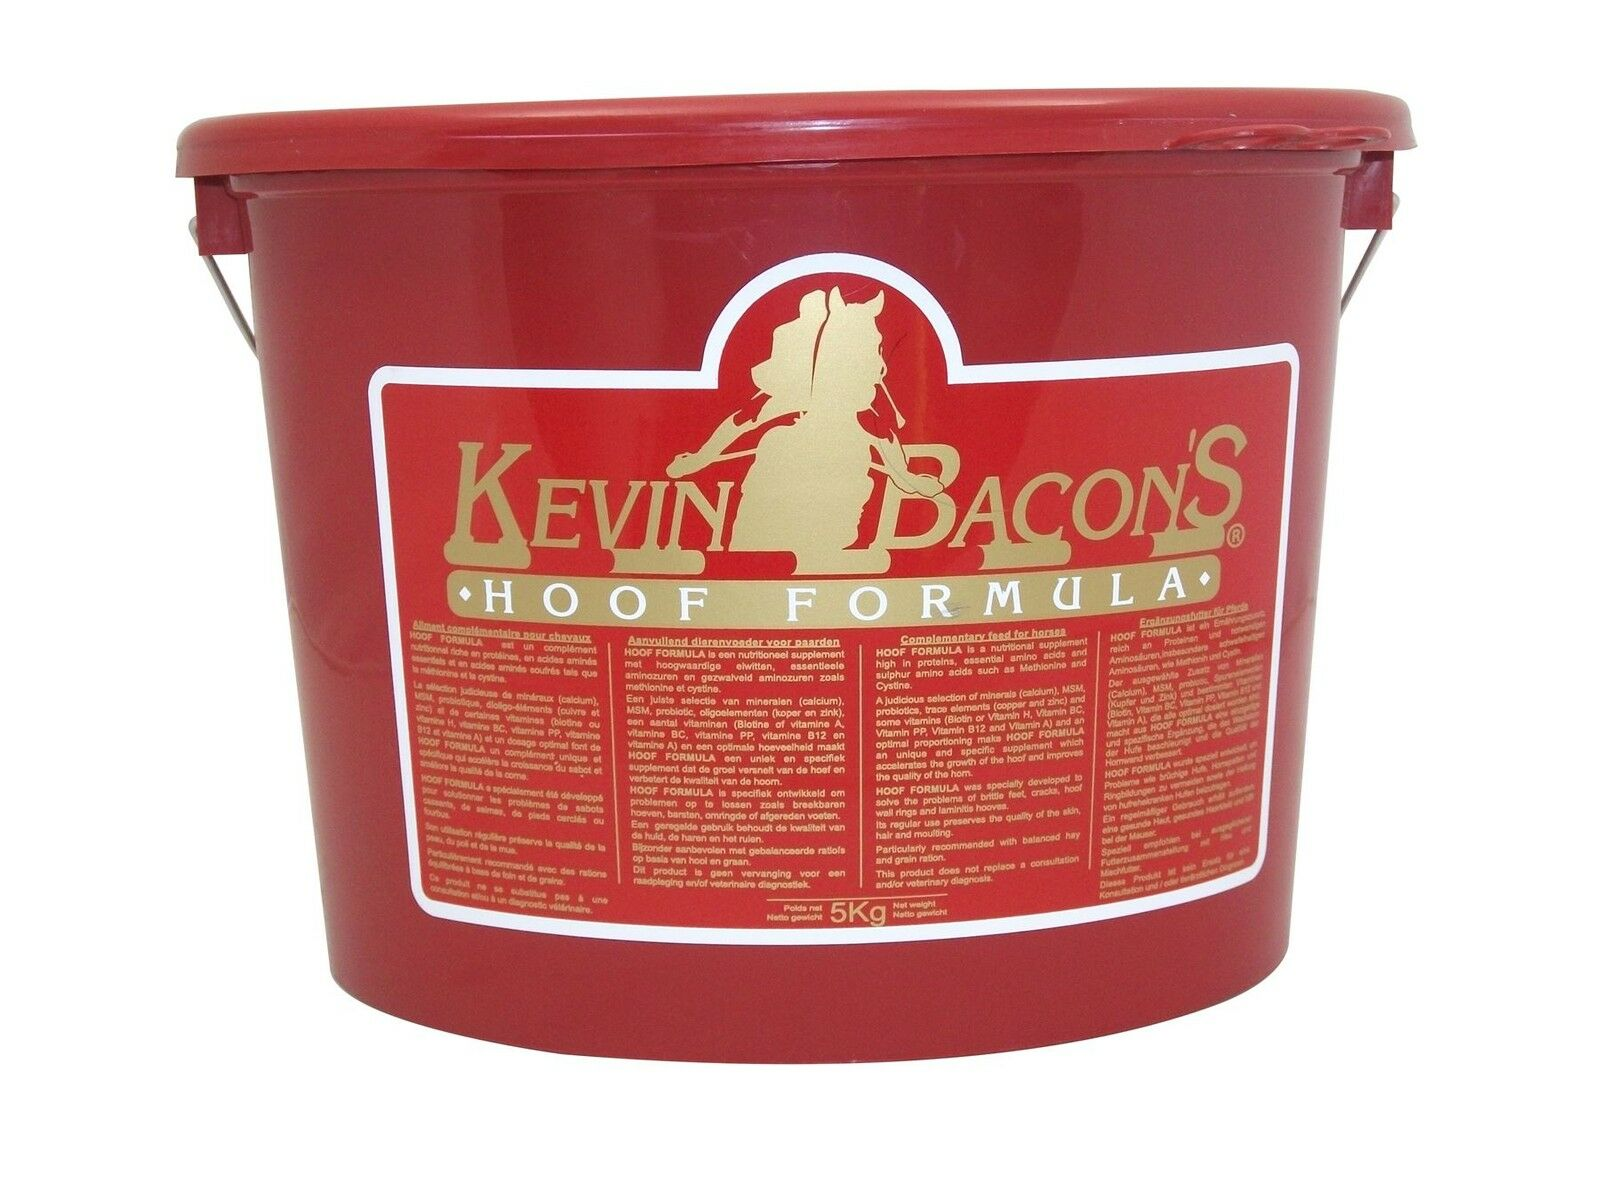 KEVIN BACON EQUINE KEVIN BACON'S HOOF FORMULA EQUINE BACON HORSE HOOVES & SKIN 507de4